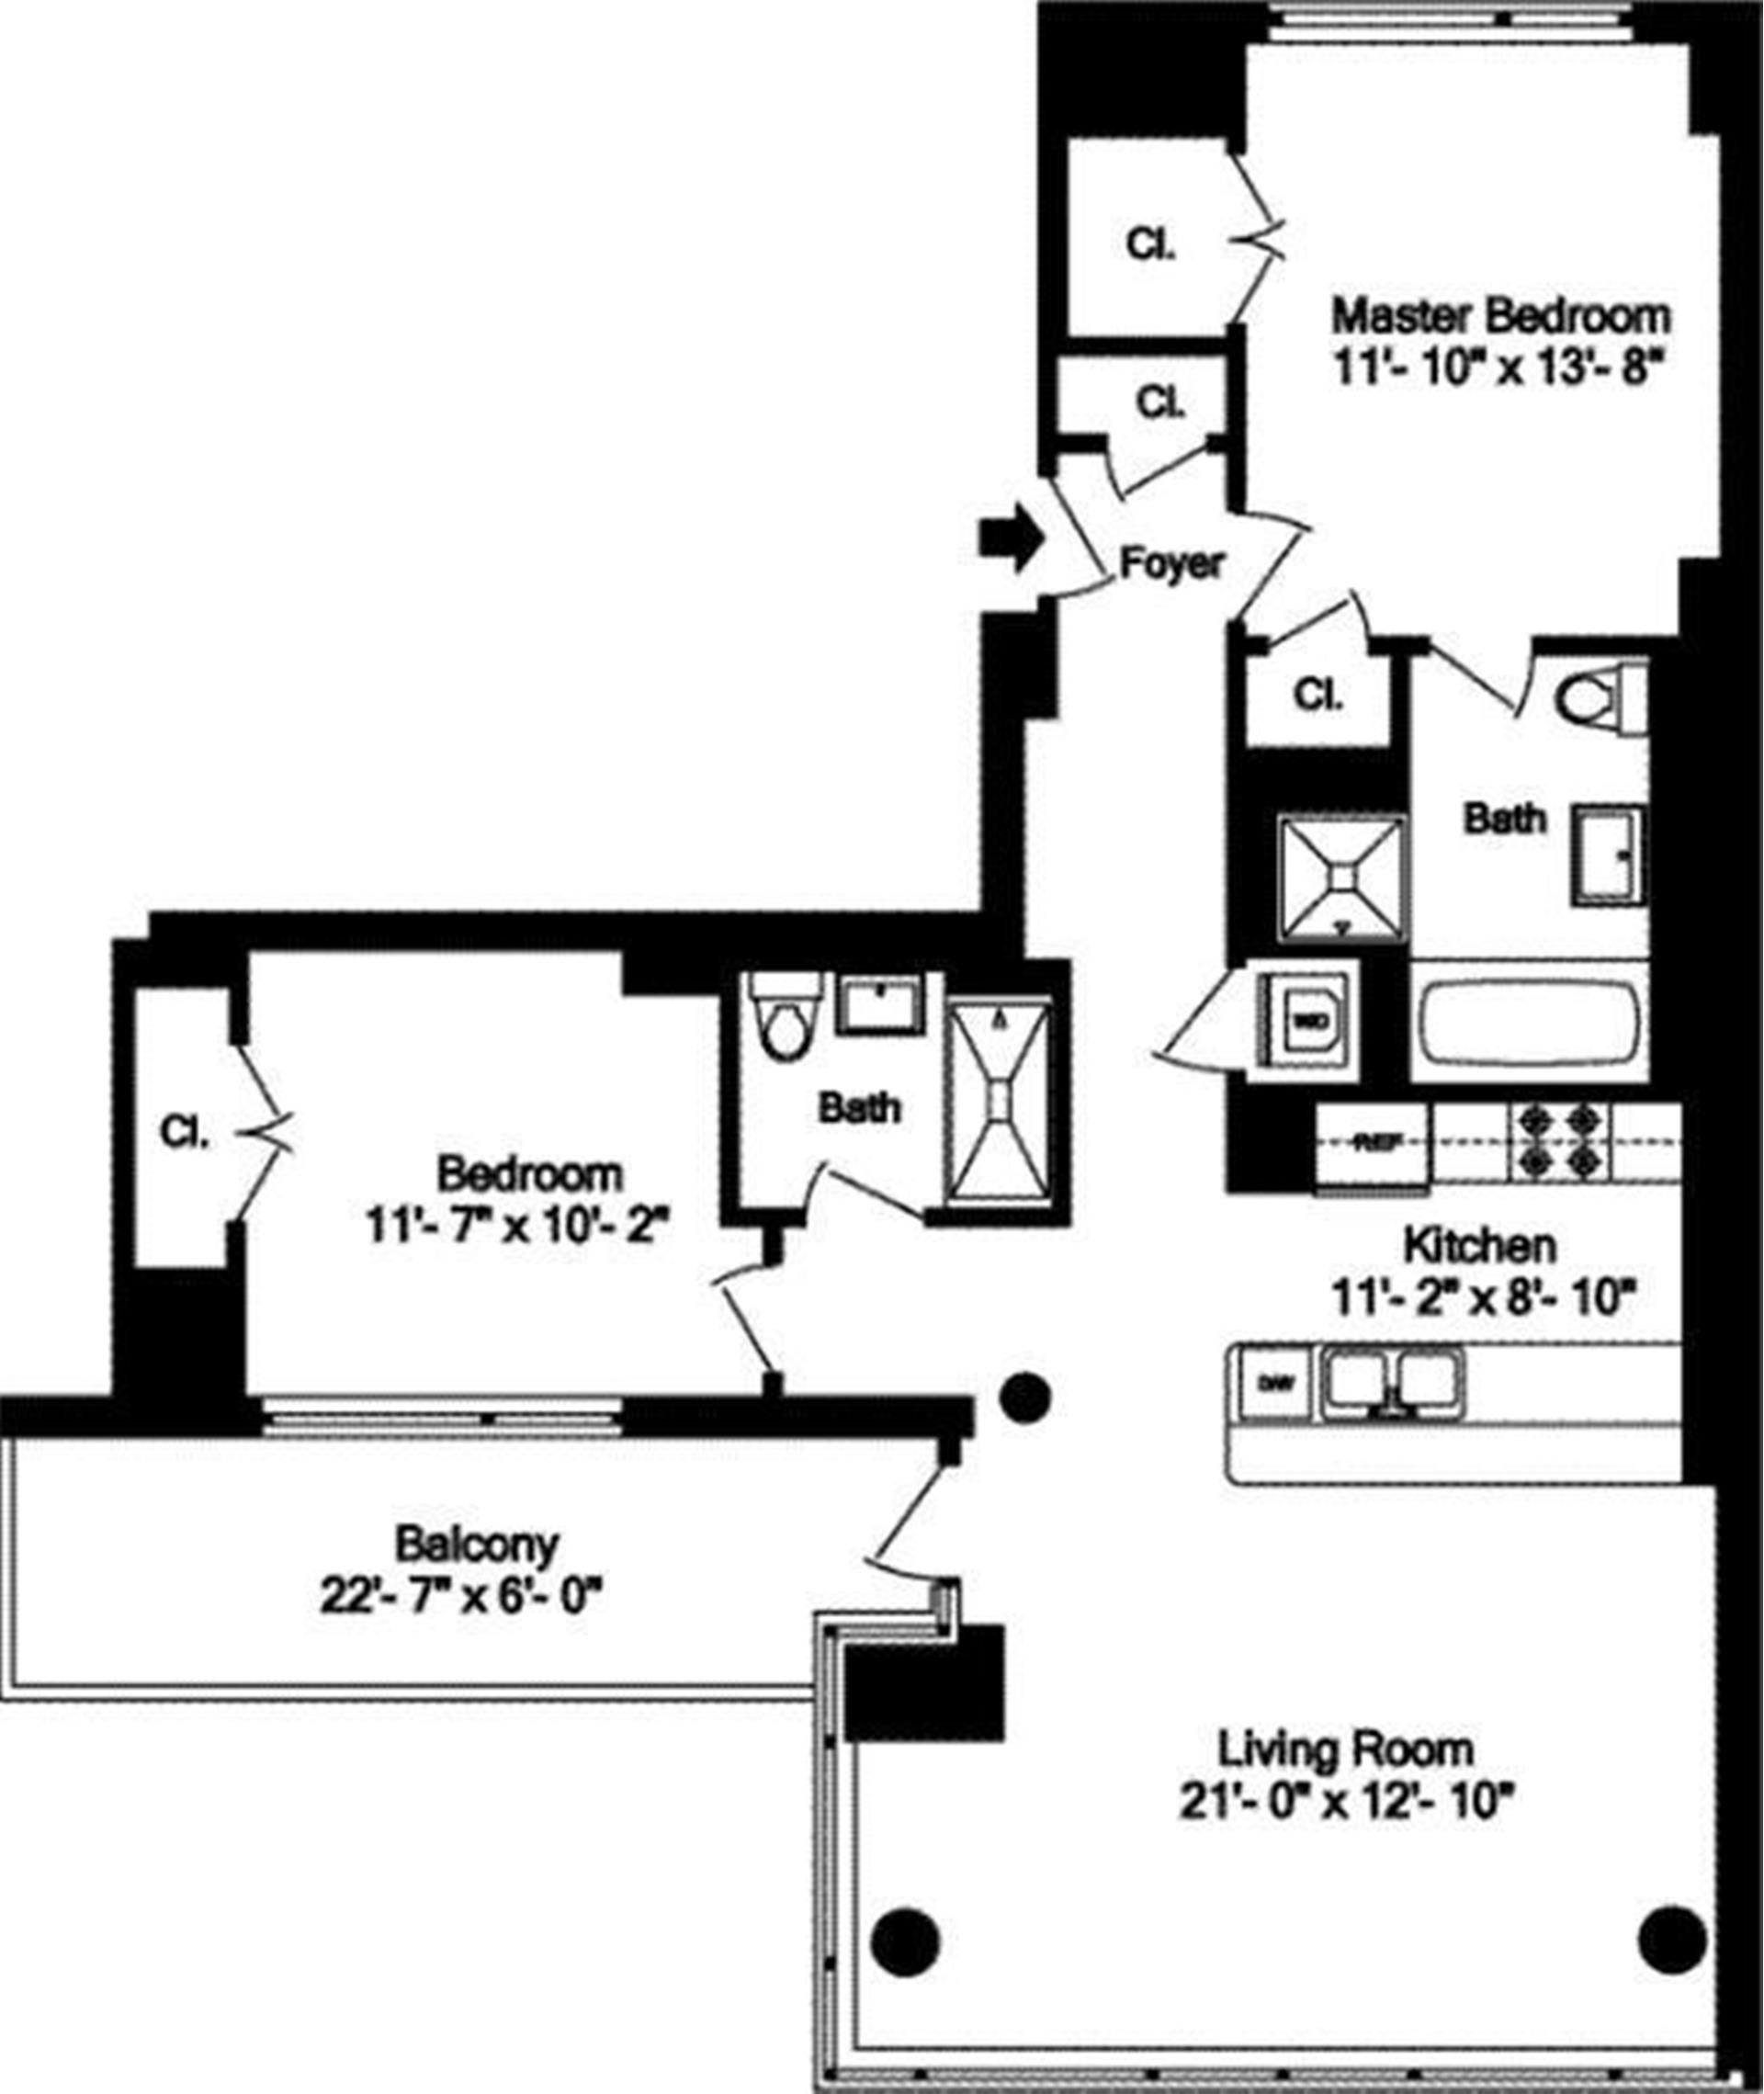 Floor plan of SLATE CONDOMINIUM, 163 West 18th St, 10B - Chelsea, New York